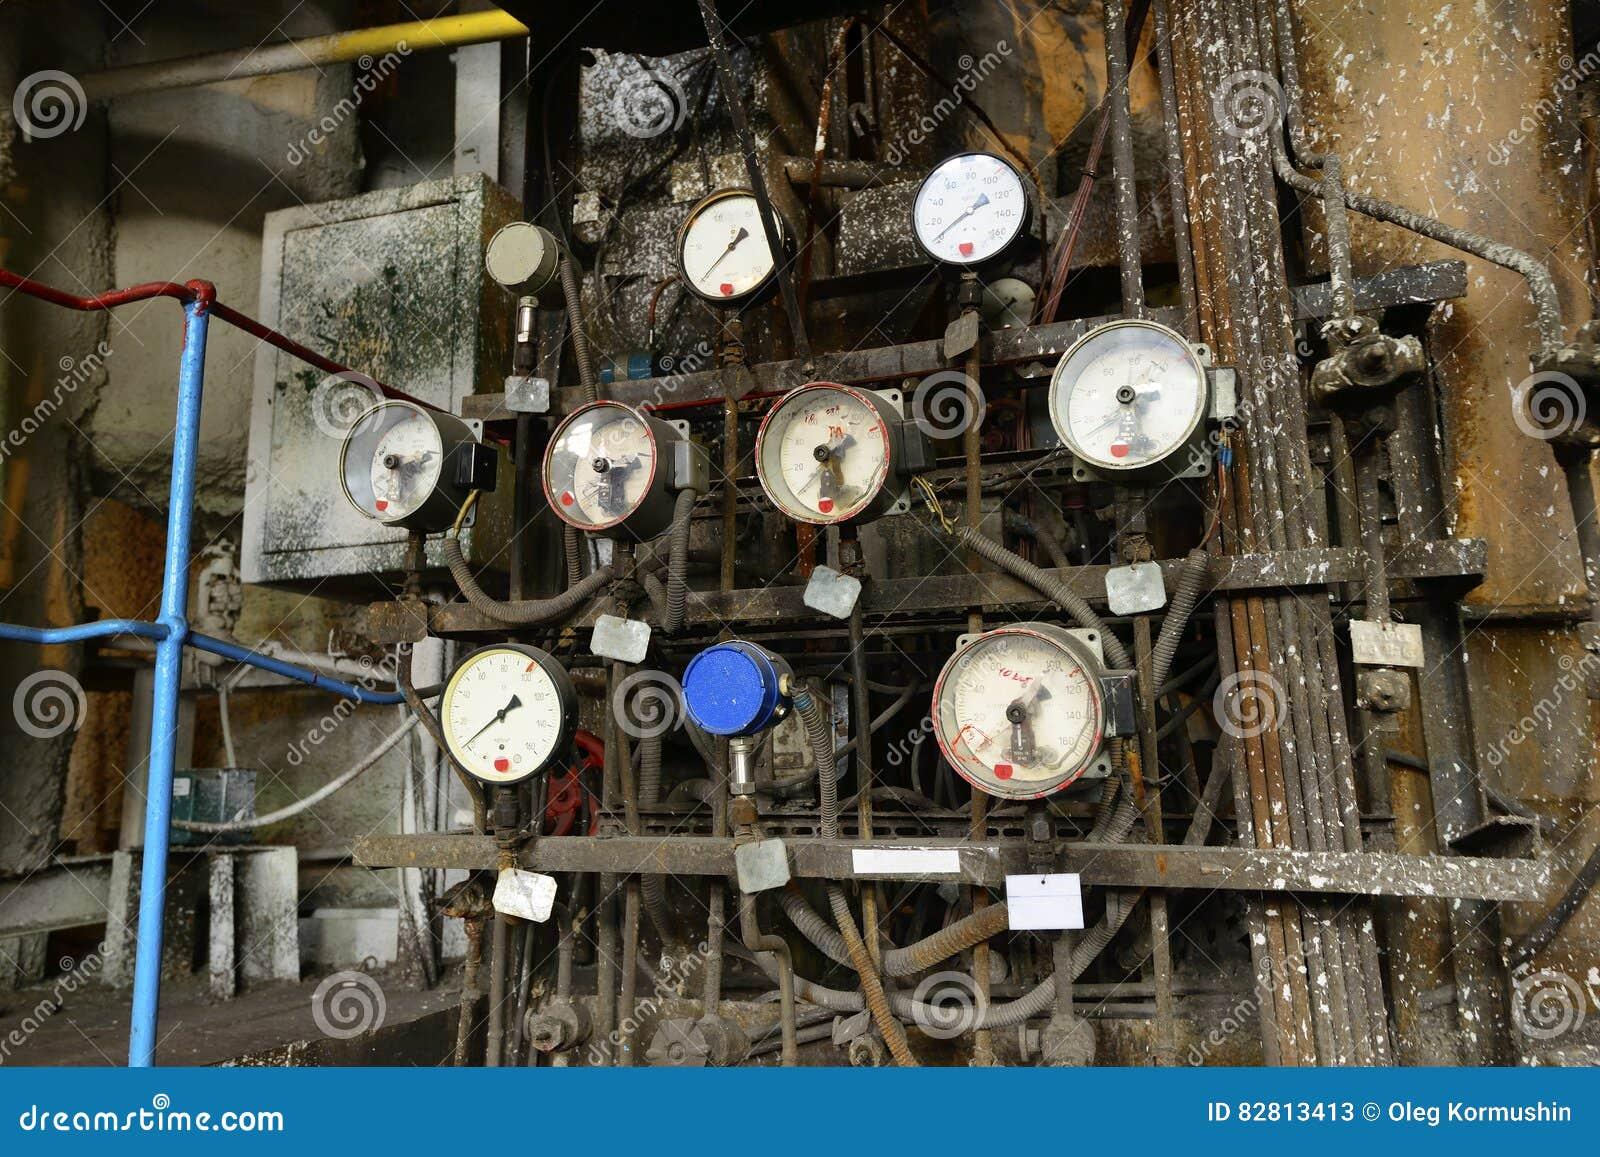 Old analog pressure meters in a power plant